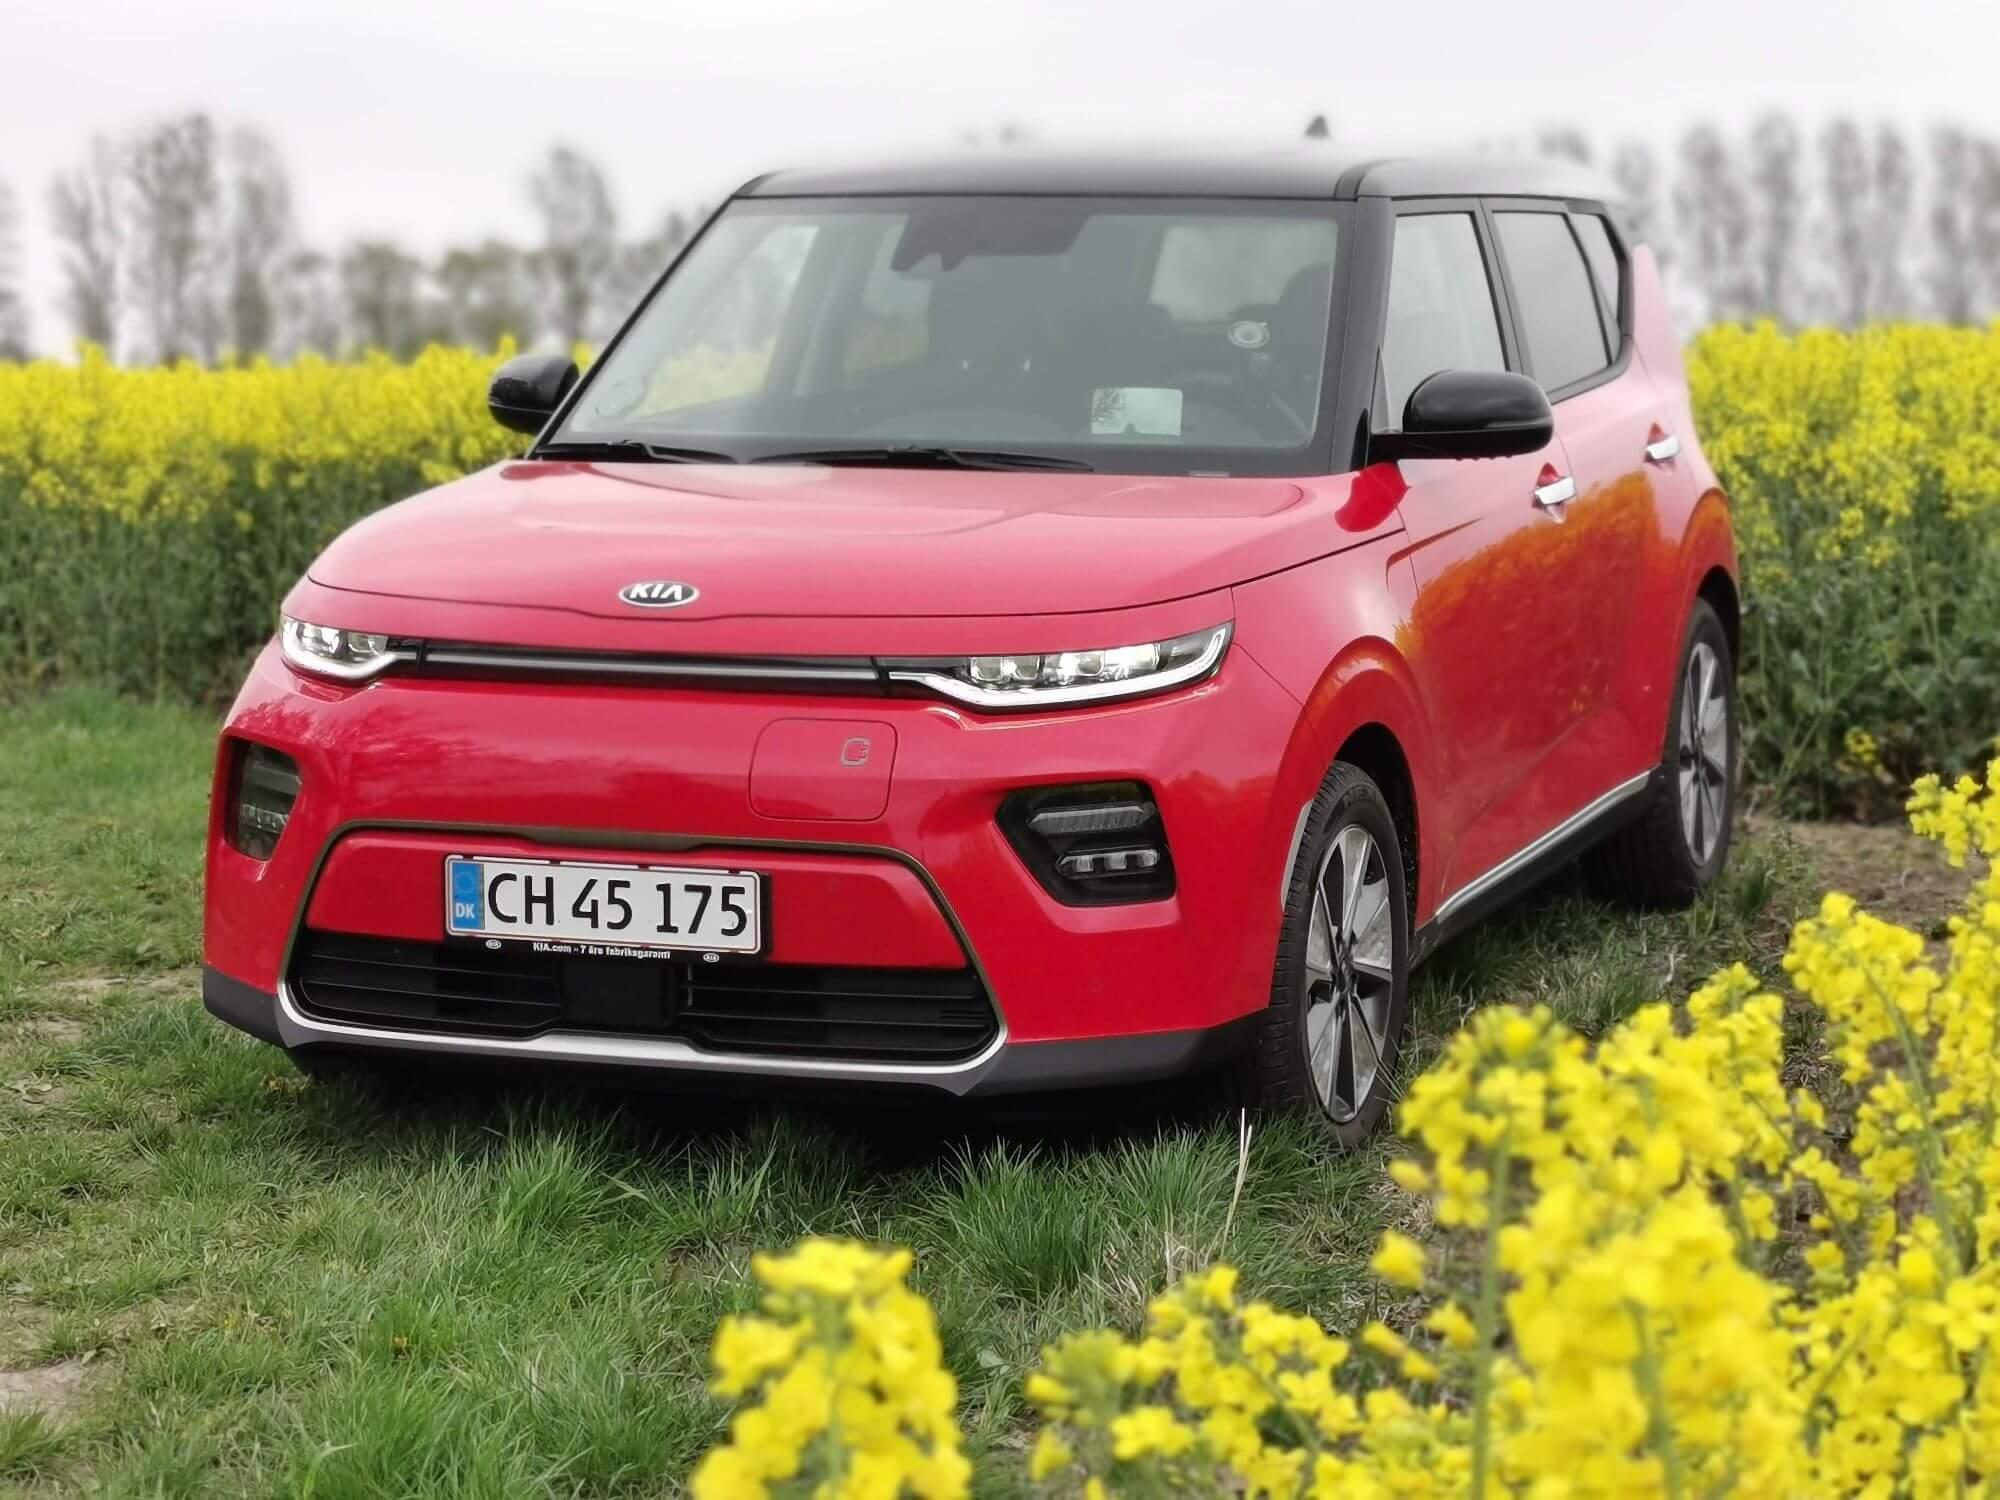 TEST: Kias ny elbil deler vandene, men er et godt køb